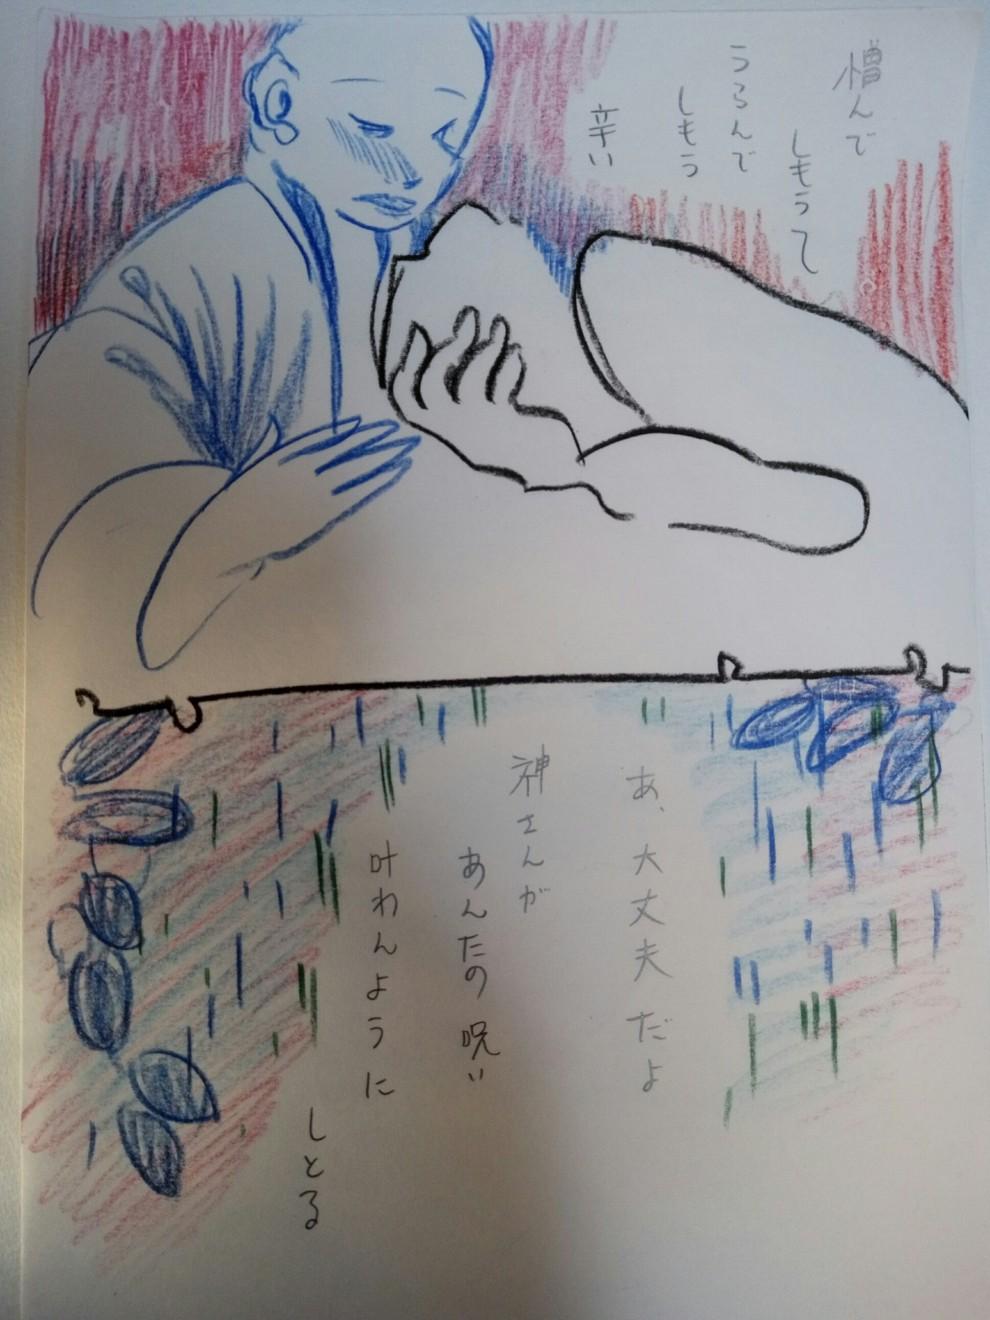 http://ahito.com/comic/ehon/voice/img/2017/20171005/03.jpg